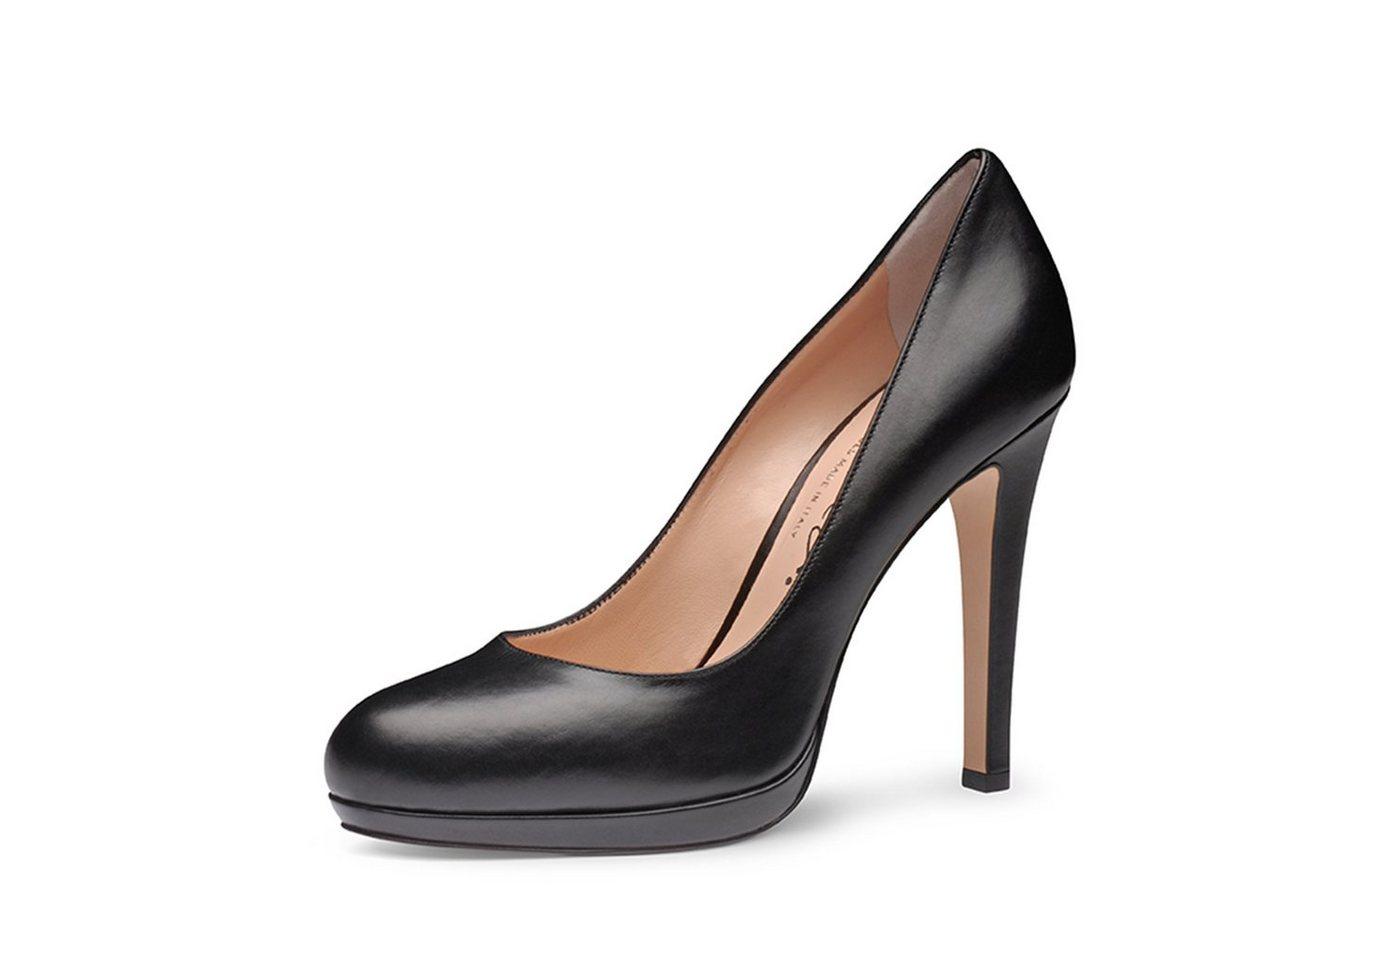 Evita »CRISTINA« High-Heel-Pumps | Schuhe > High Heels > High Heel Pumps | Schwarz | Evita